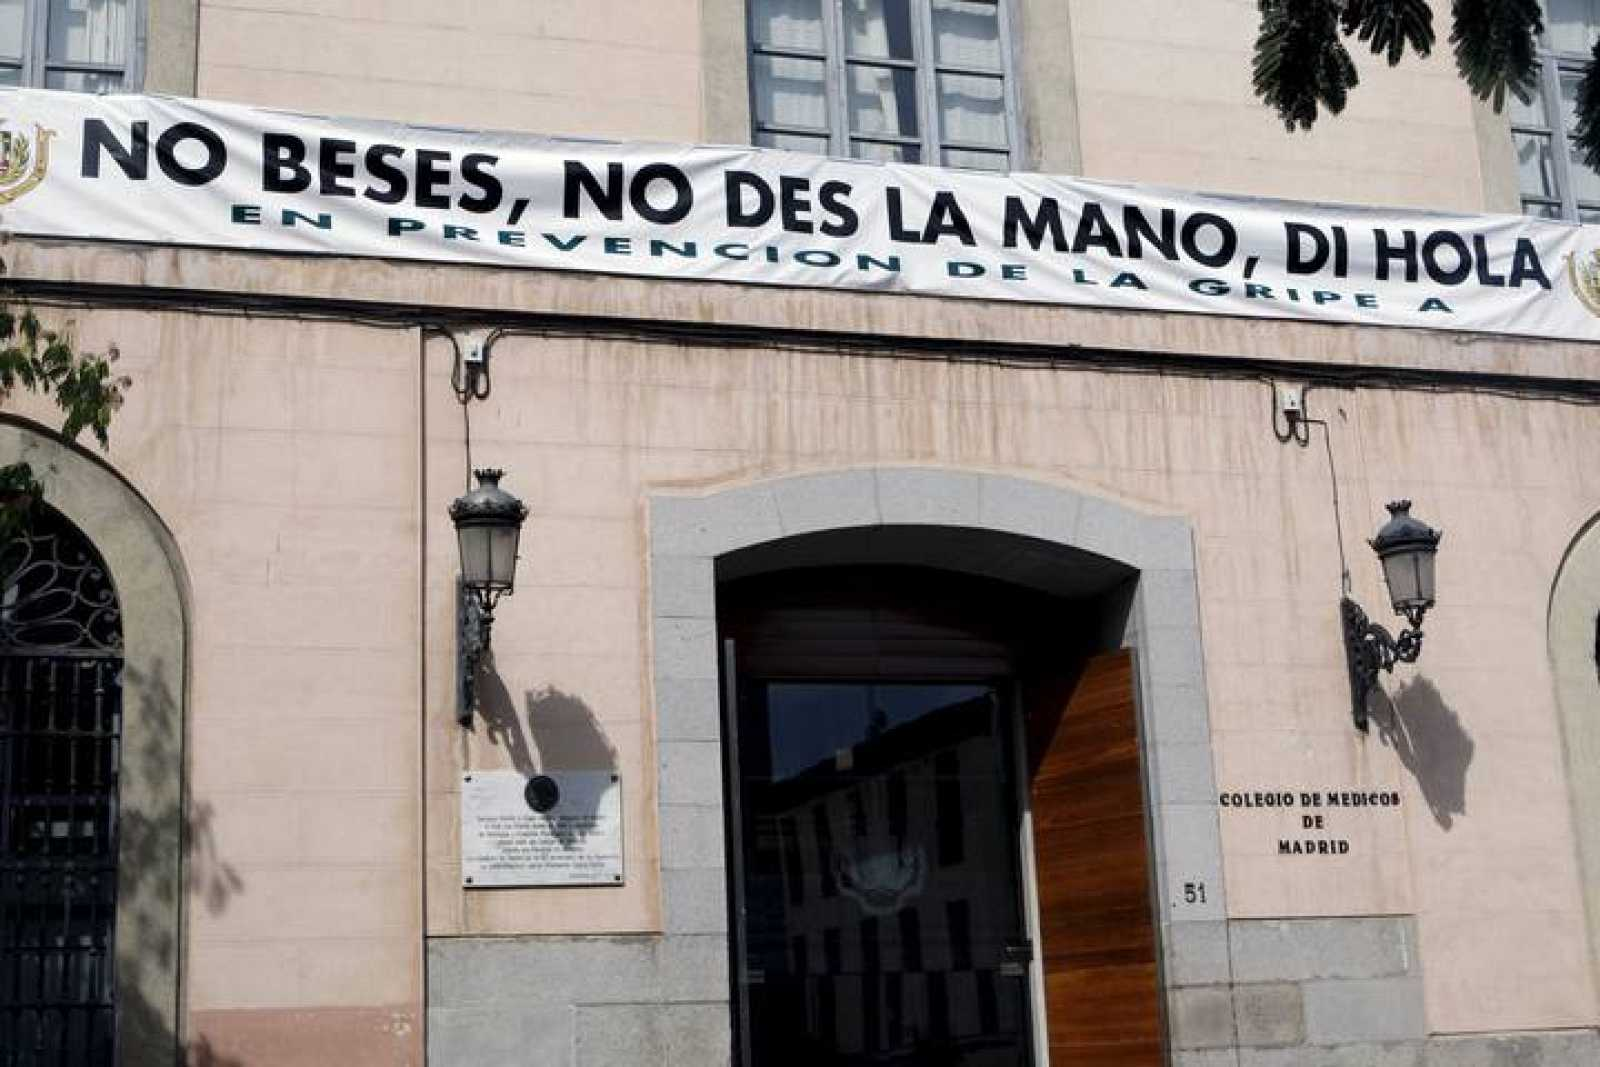 """NO BESES, NO DES LA MANO, DI HOLA"""